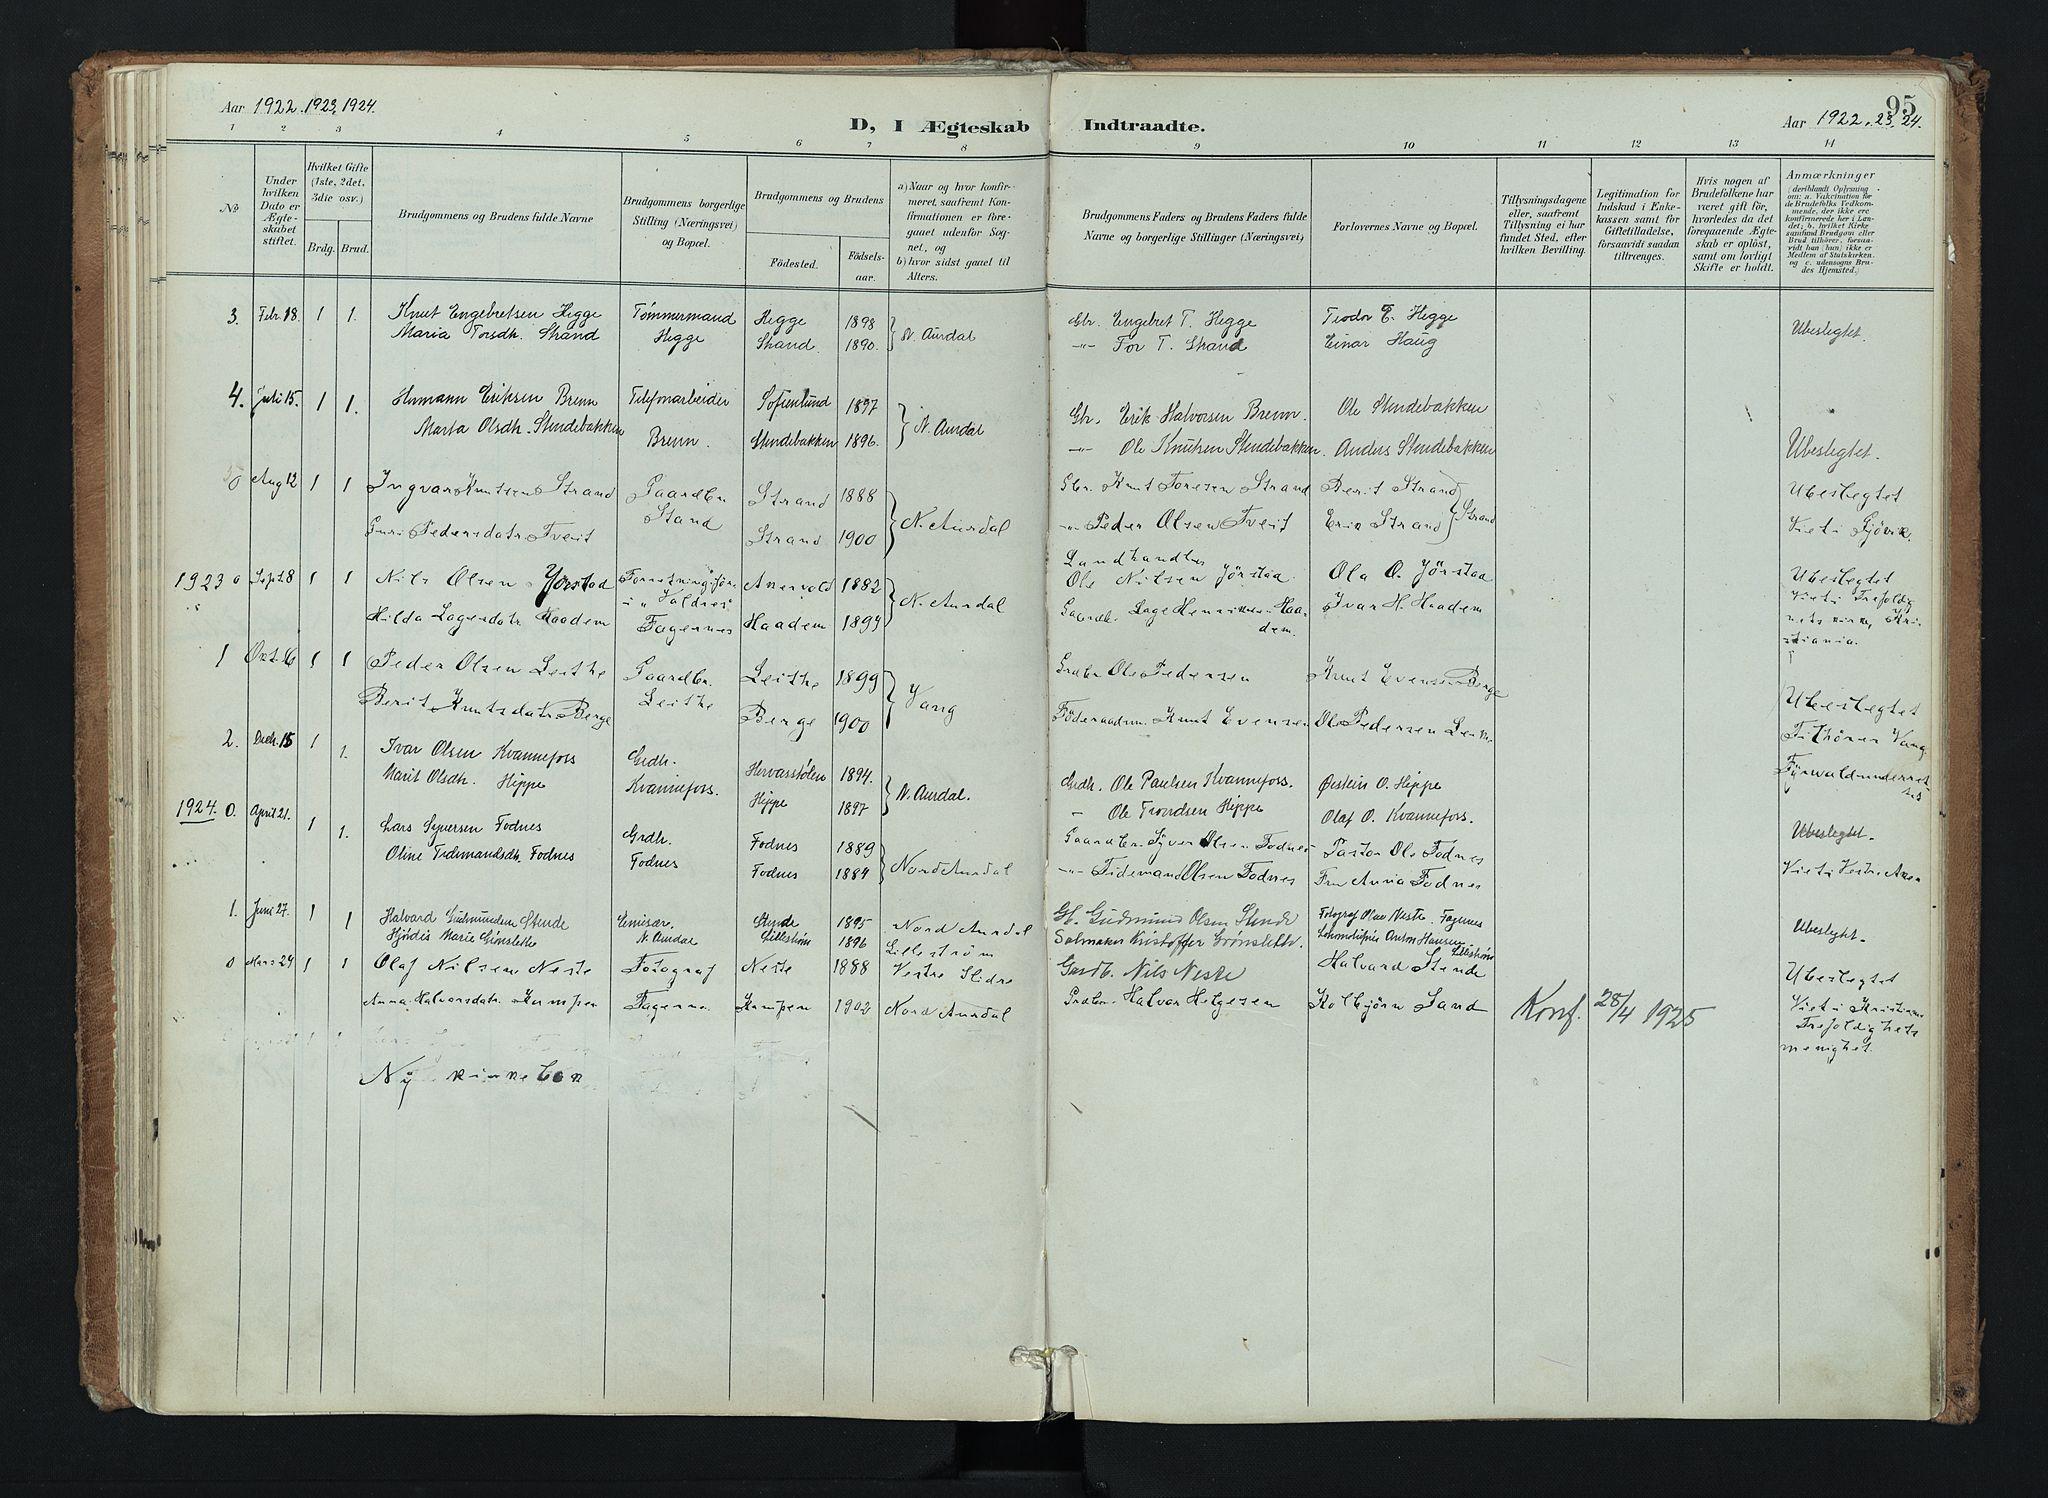 SAH, Nord-Aurdal prestekontor, Ministerialbok nr. 16, 1897-1925, s. 95